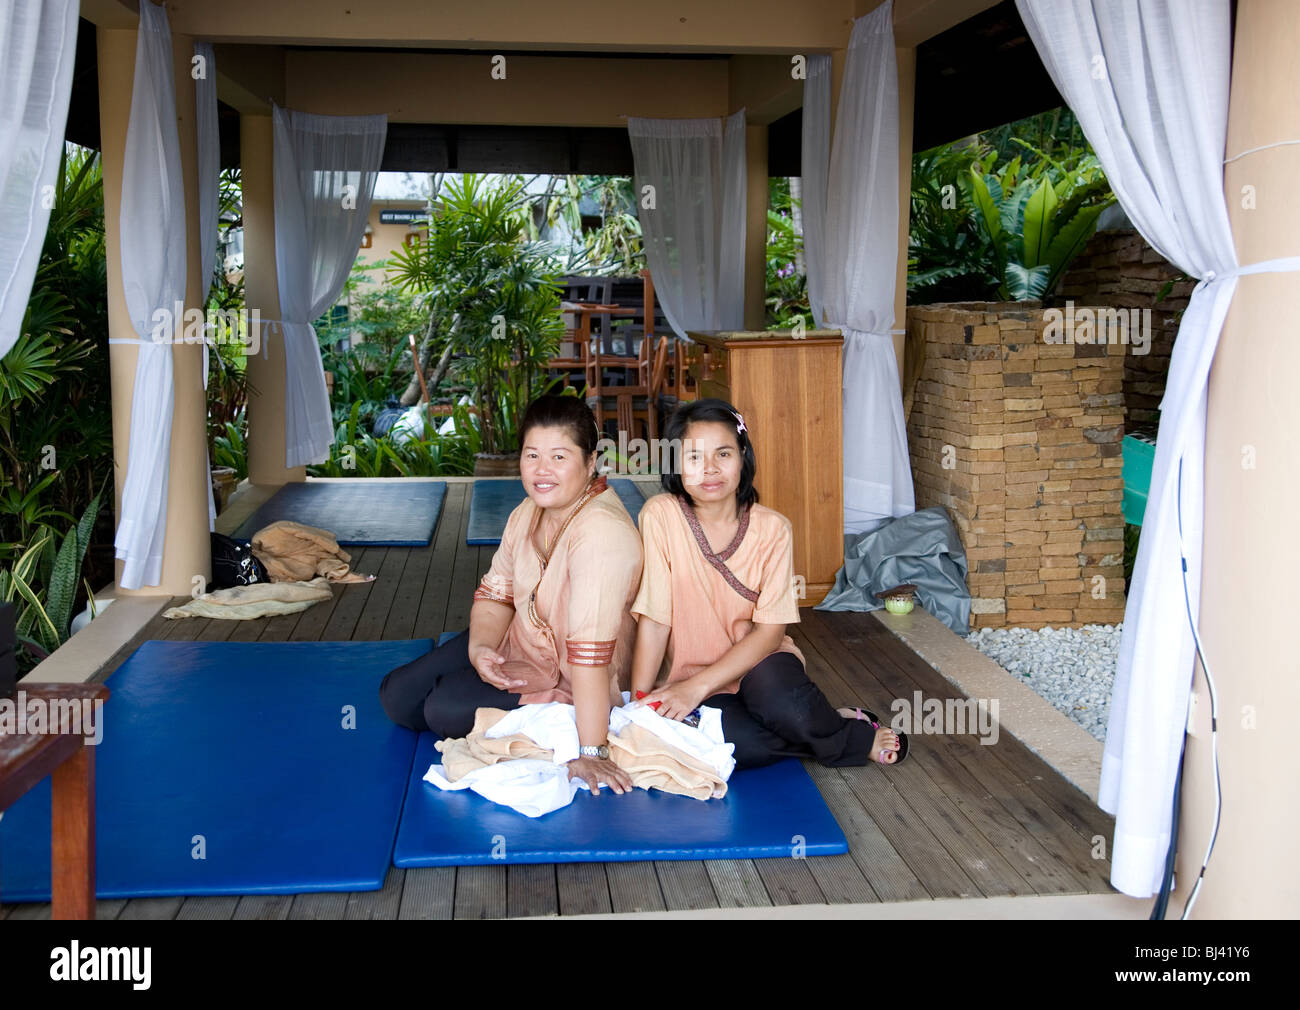 Two masseuse at Karon Beach Resort in Phuket - Thailand Stock Photo